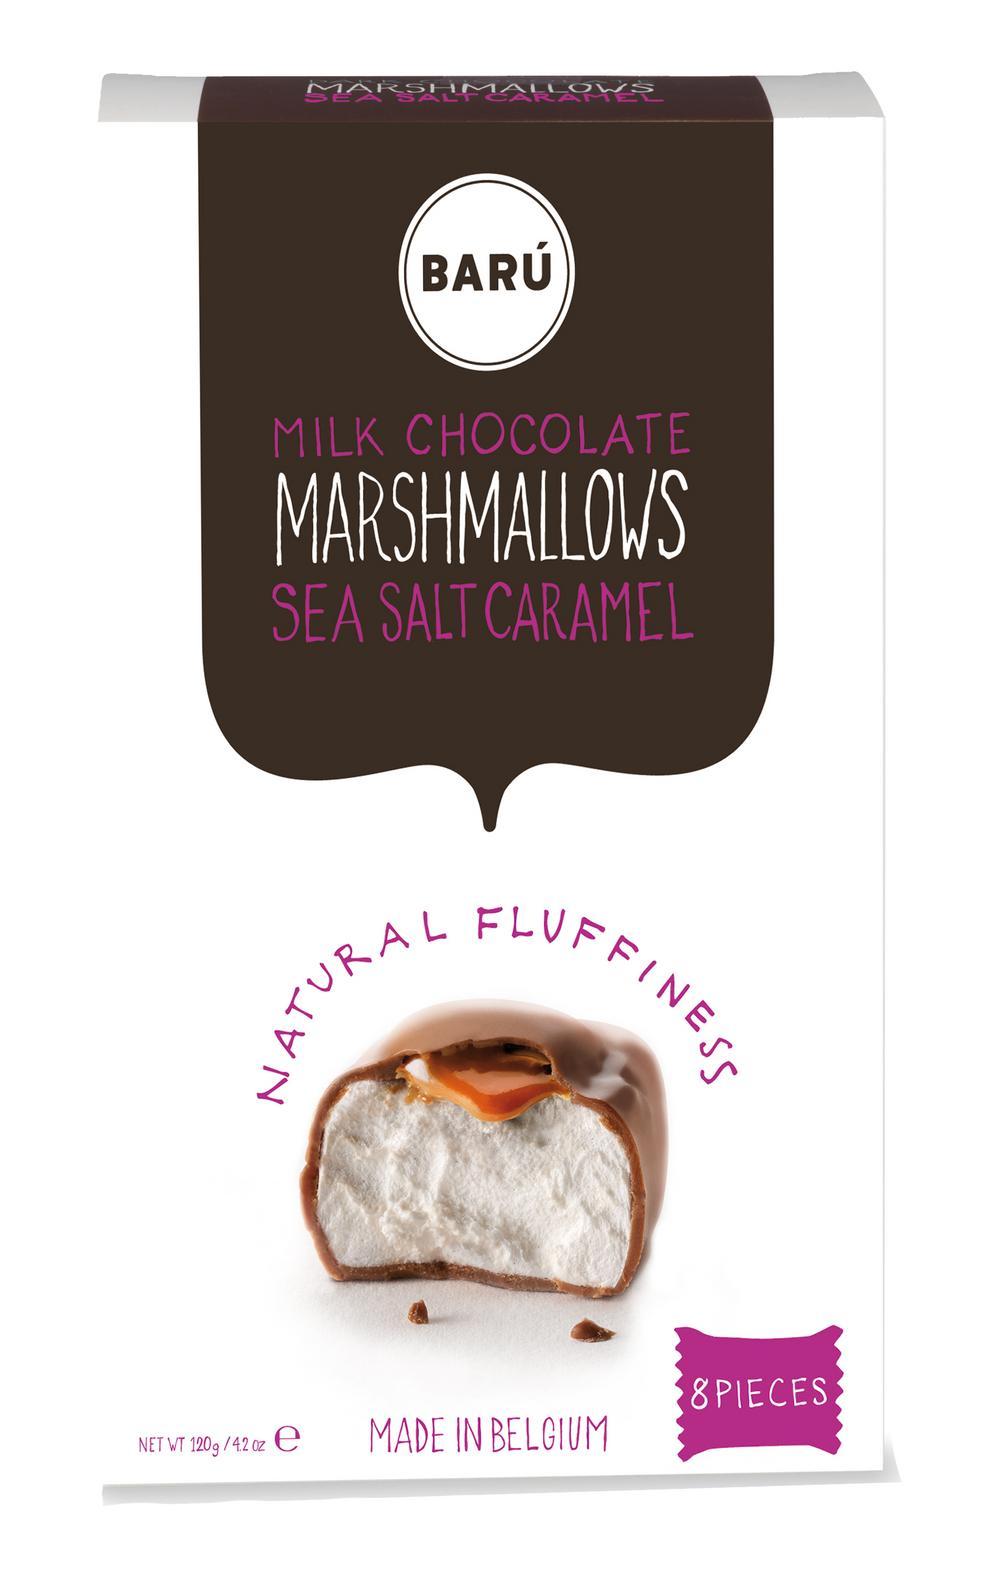 Milk Chocolate Sea Salt Caramel Marshmallows